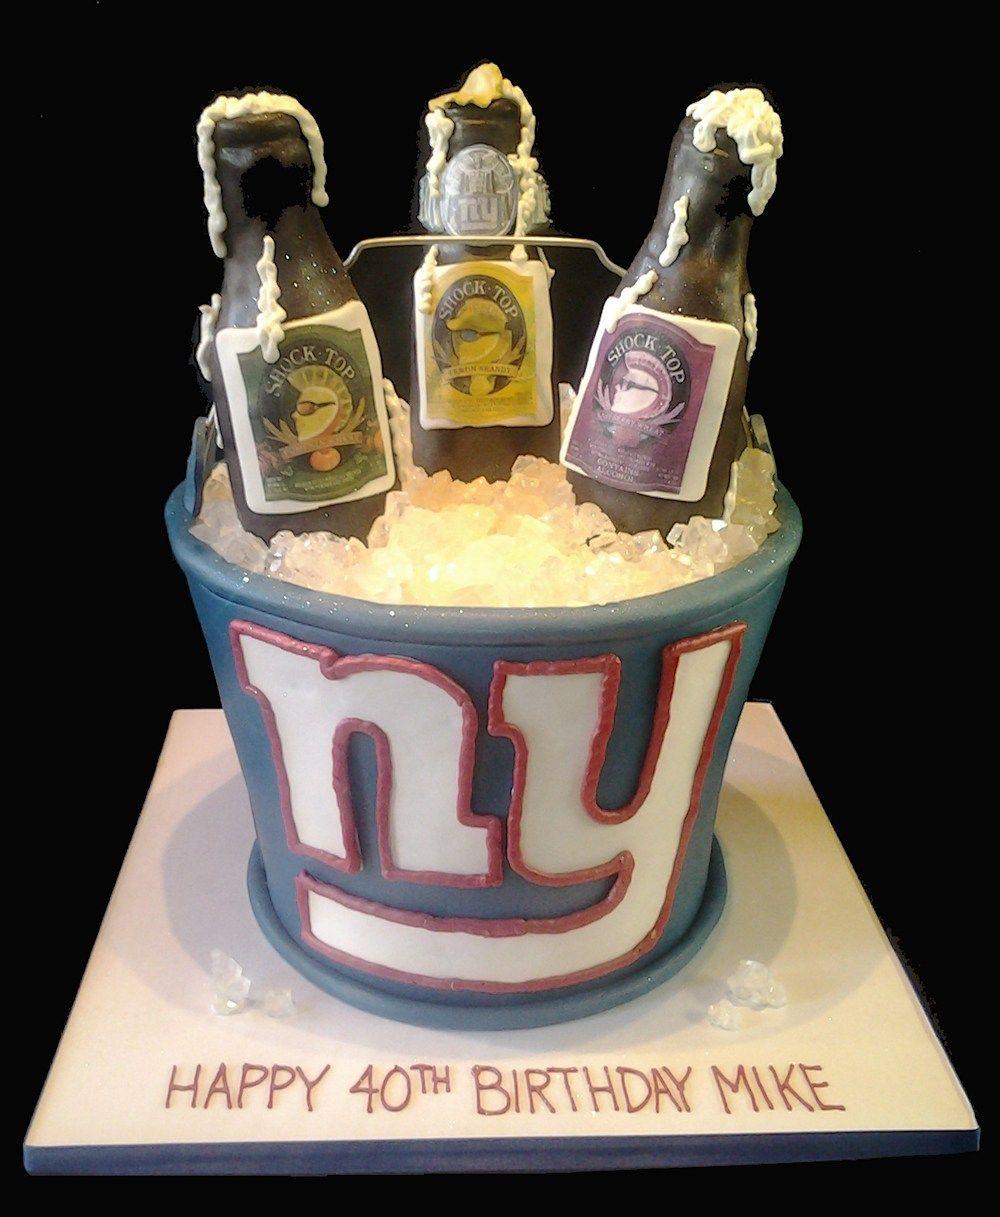 Pretty Image Of Cakes For Mens Birthday Cake Photos Jpg 1000x1217 24th Men